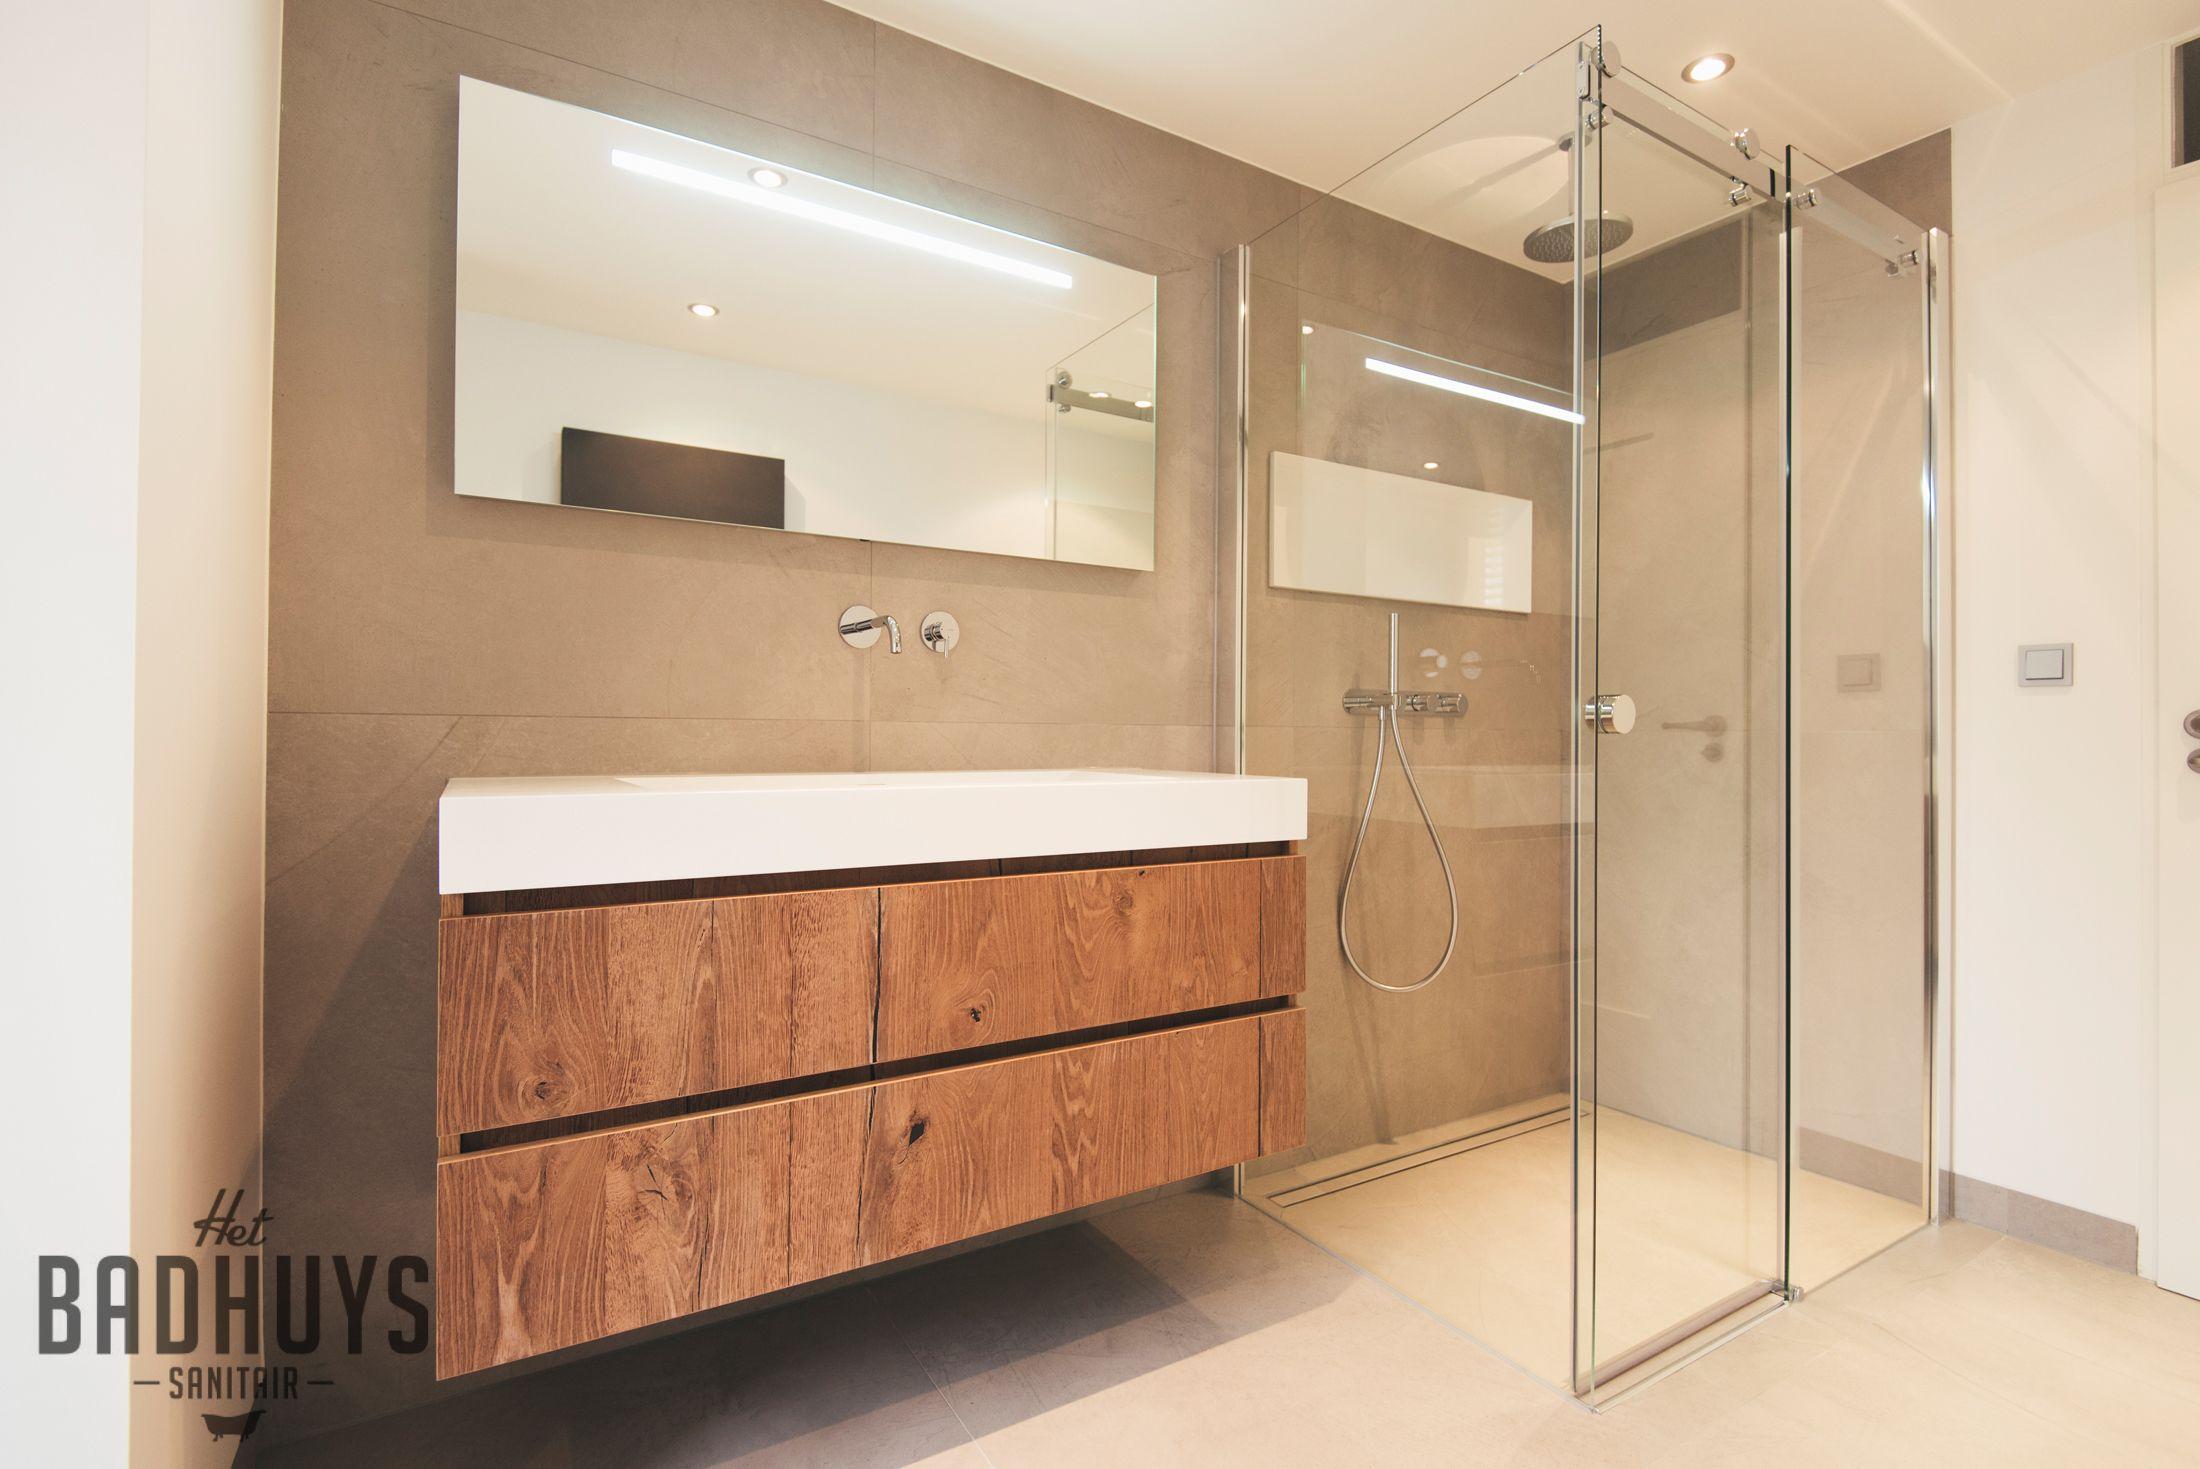 Badkamer met warme uitstraling en ruime inbouwkast